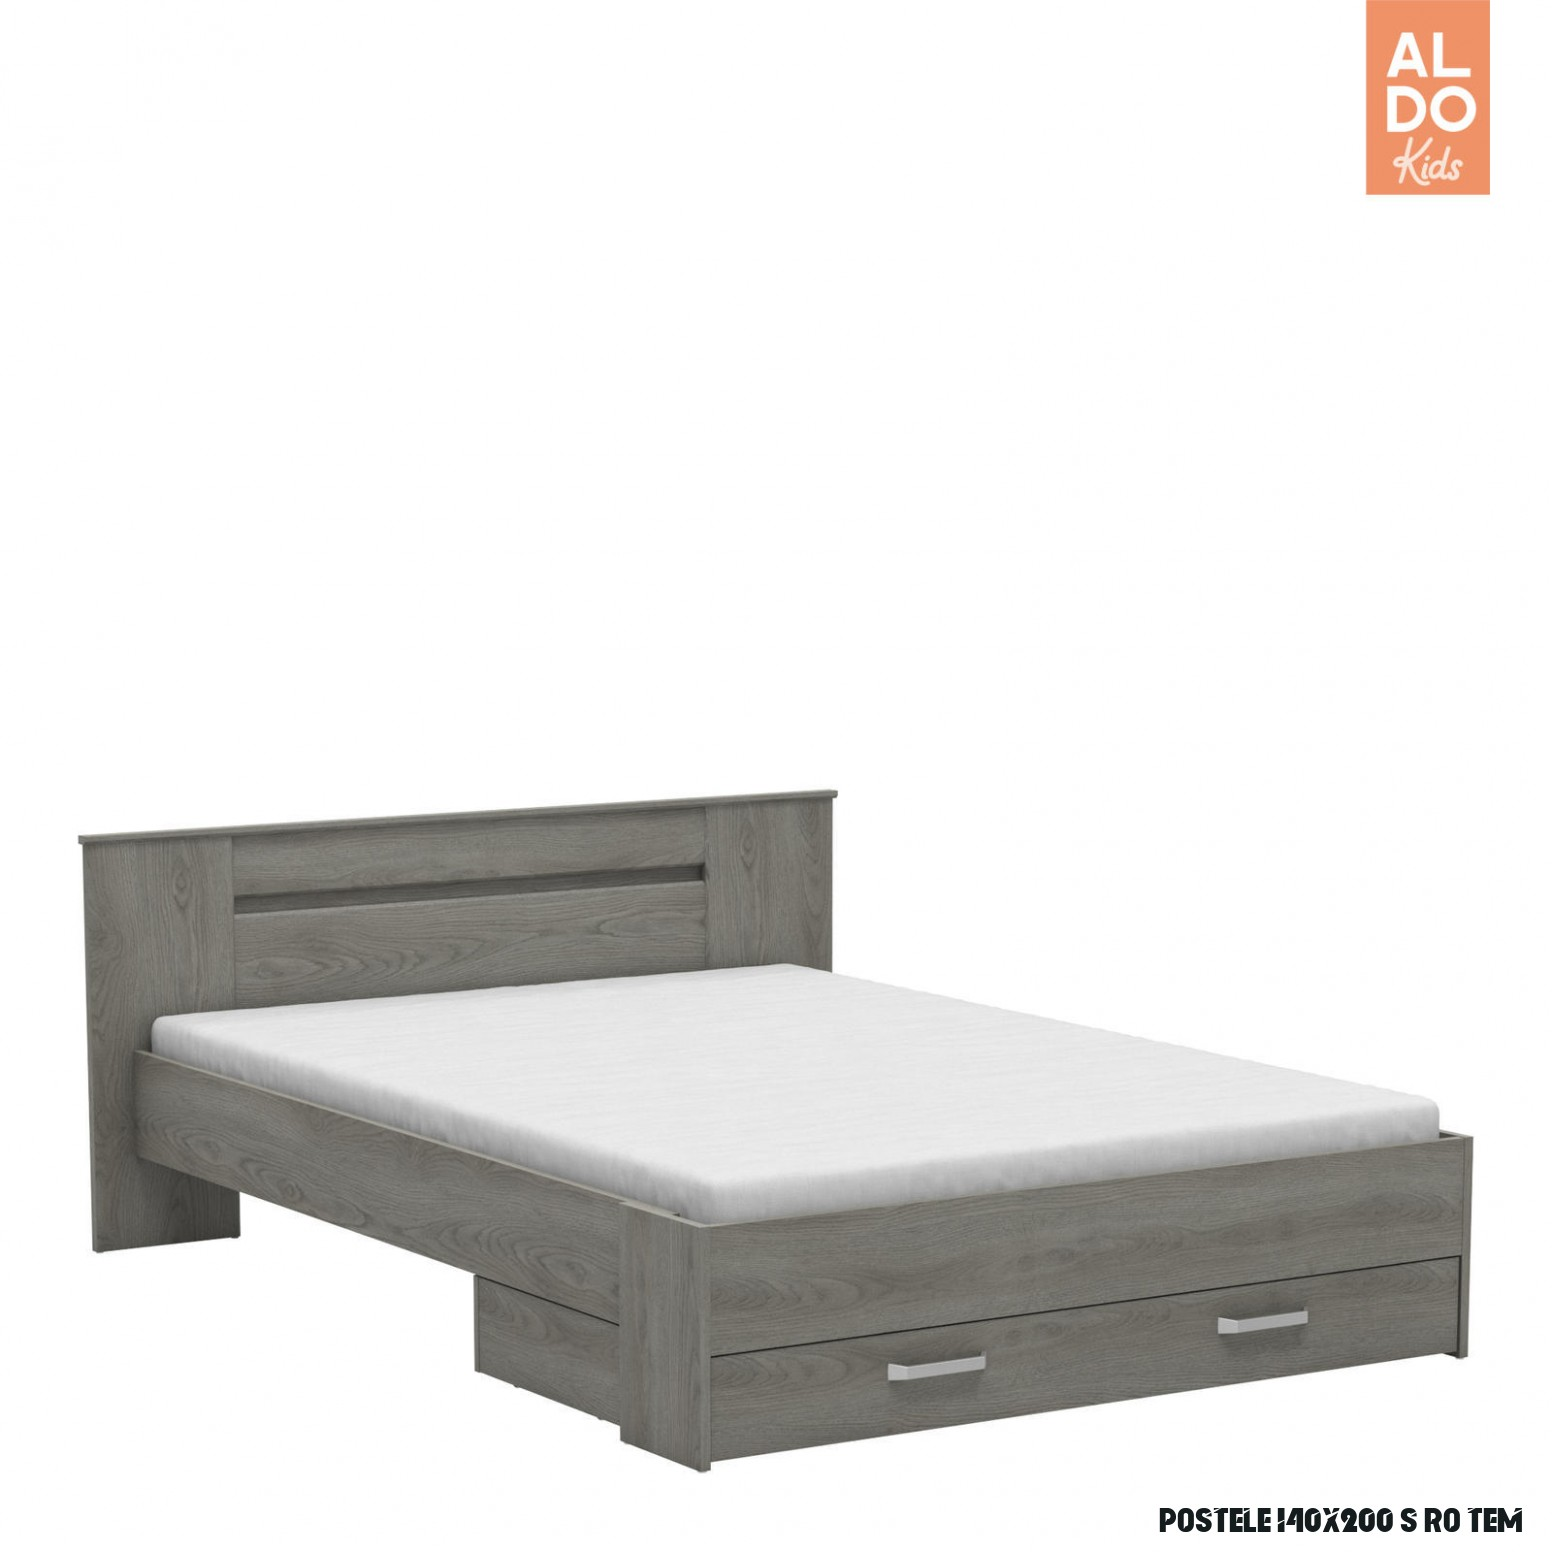 Studentská postel 14x14 s šuplíkem Divine